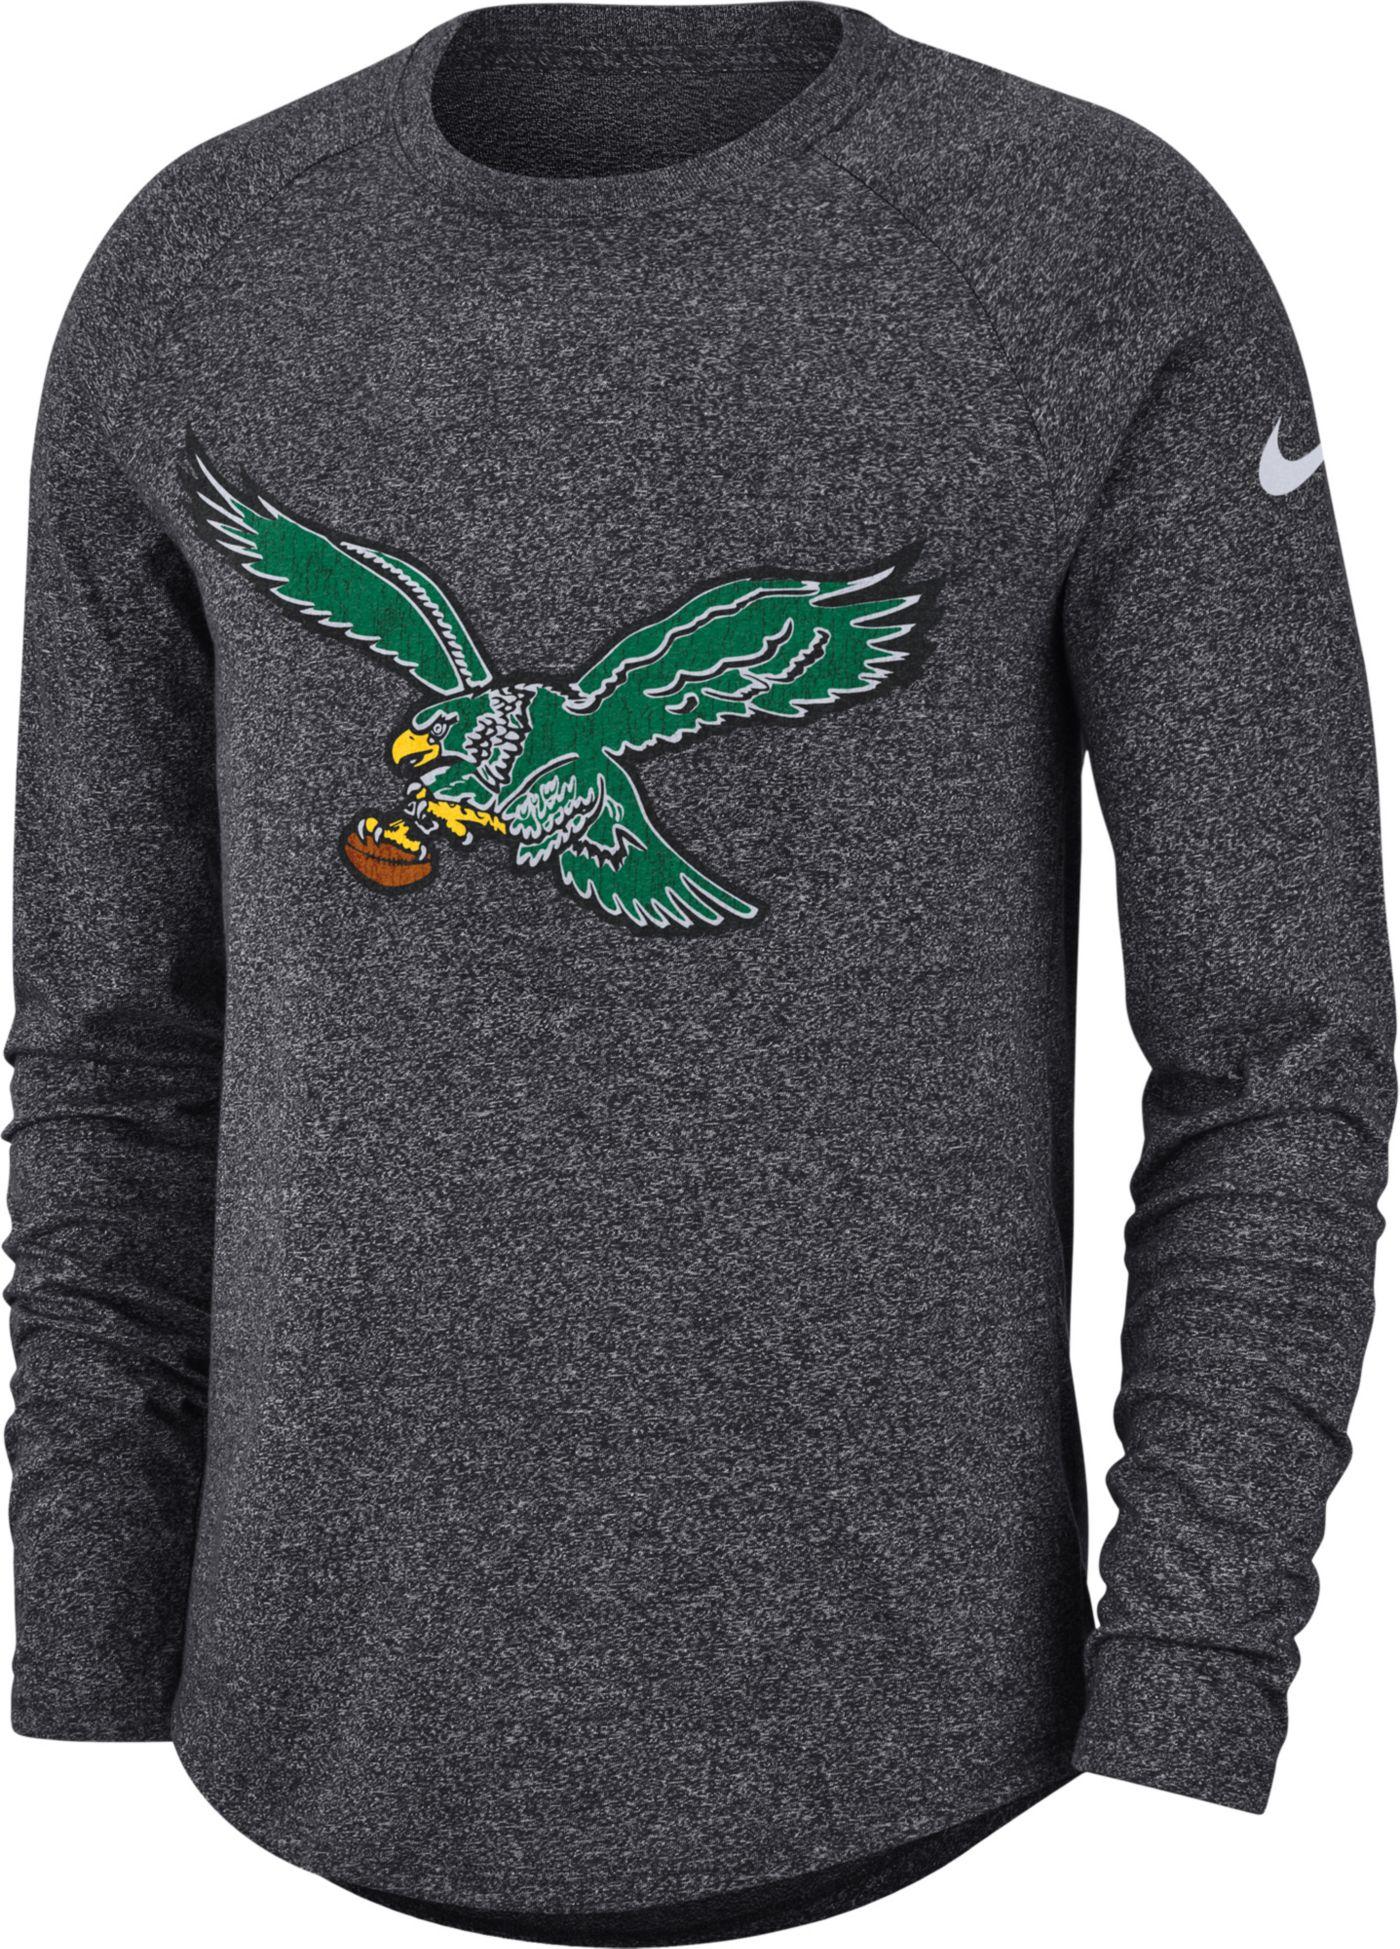 Nike Men's Philadelphia Eagles Marled Historic Performance Anthracite Long Sleeve Shirt